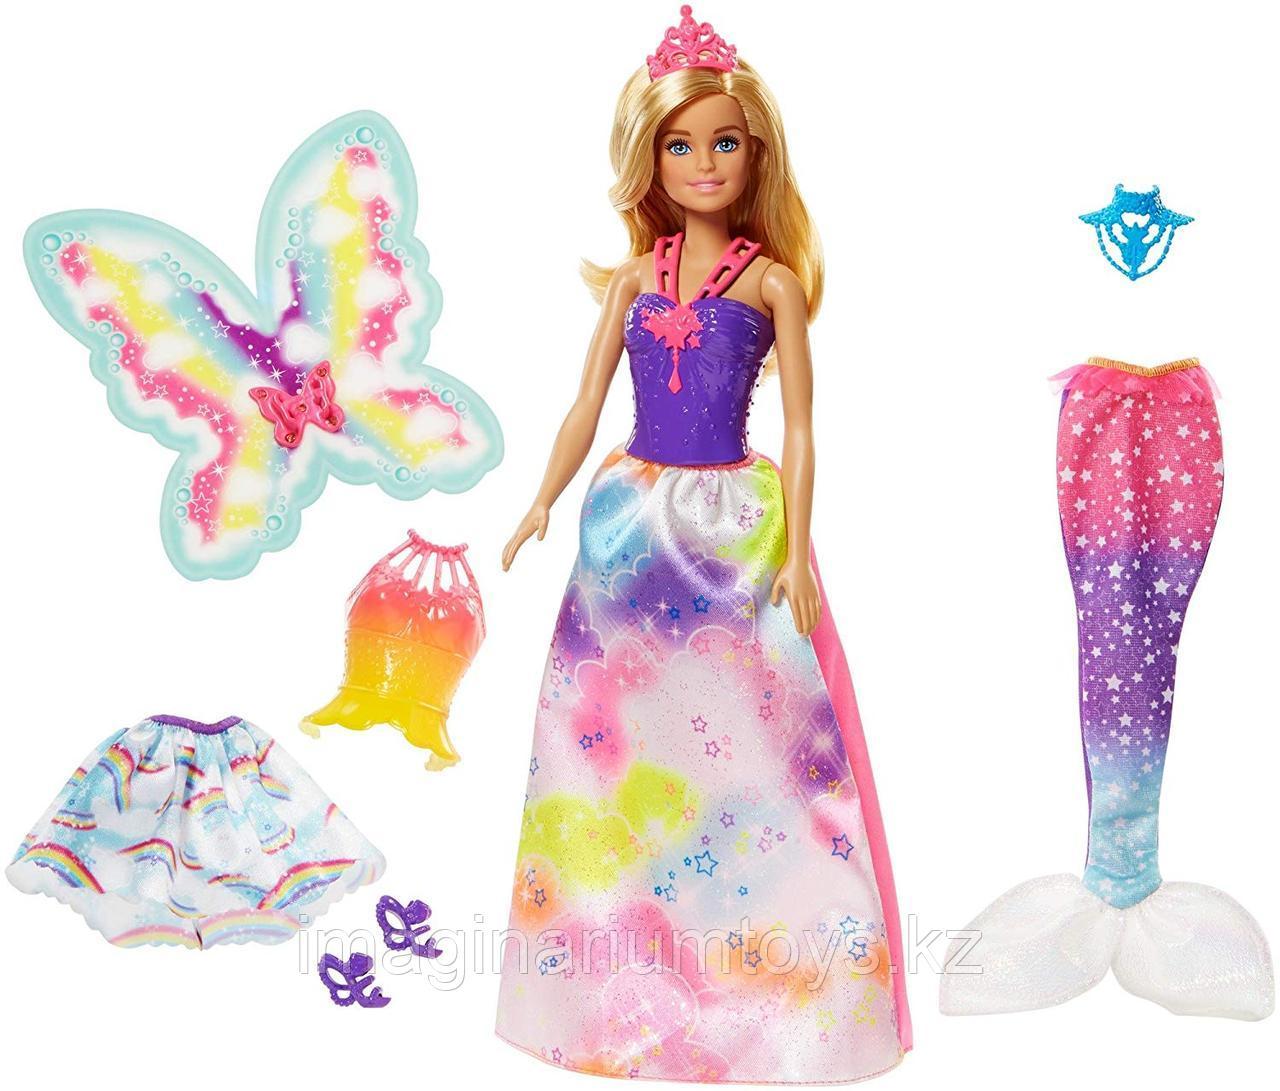 Кукла Барби Dreamtopia с комплектом одежды